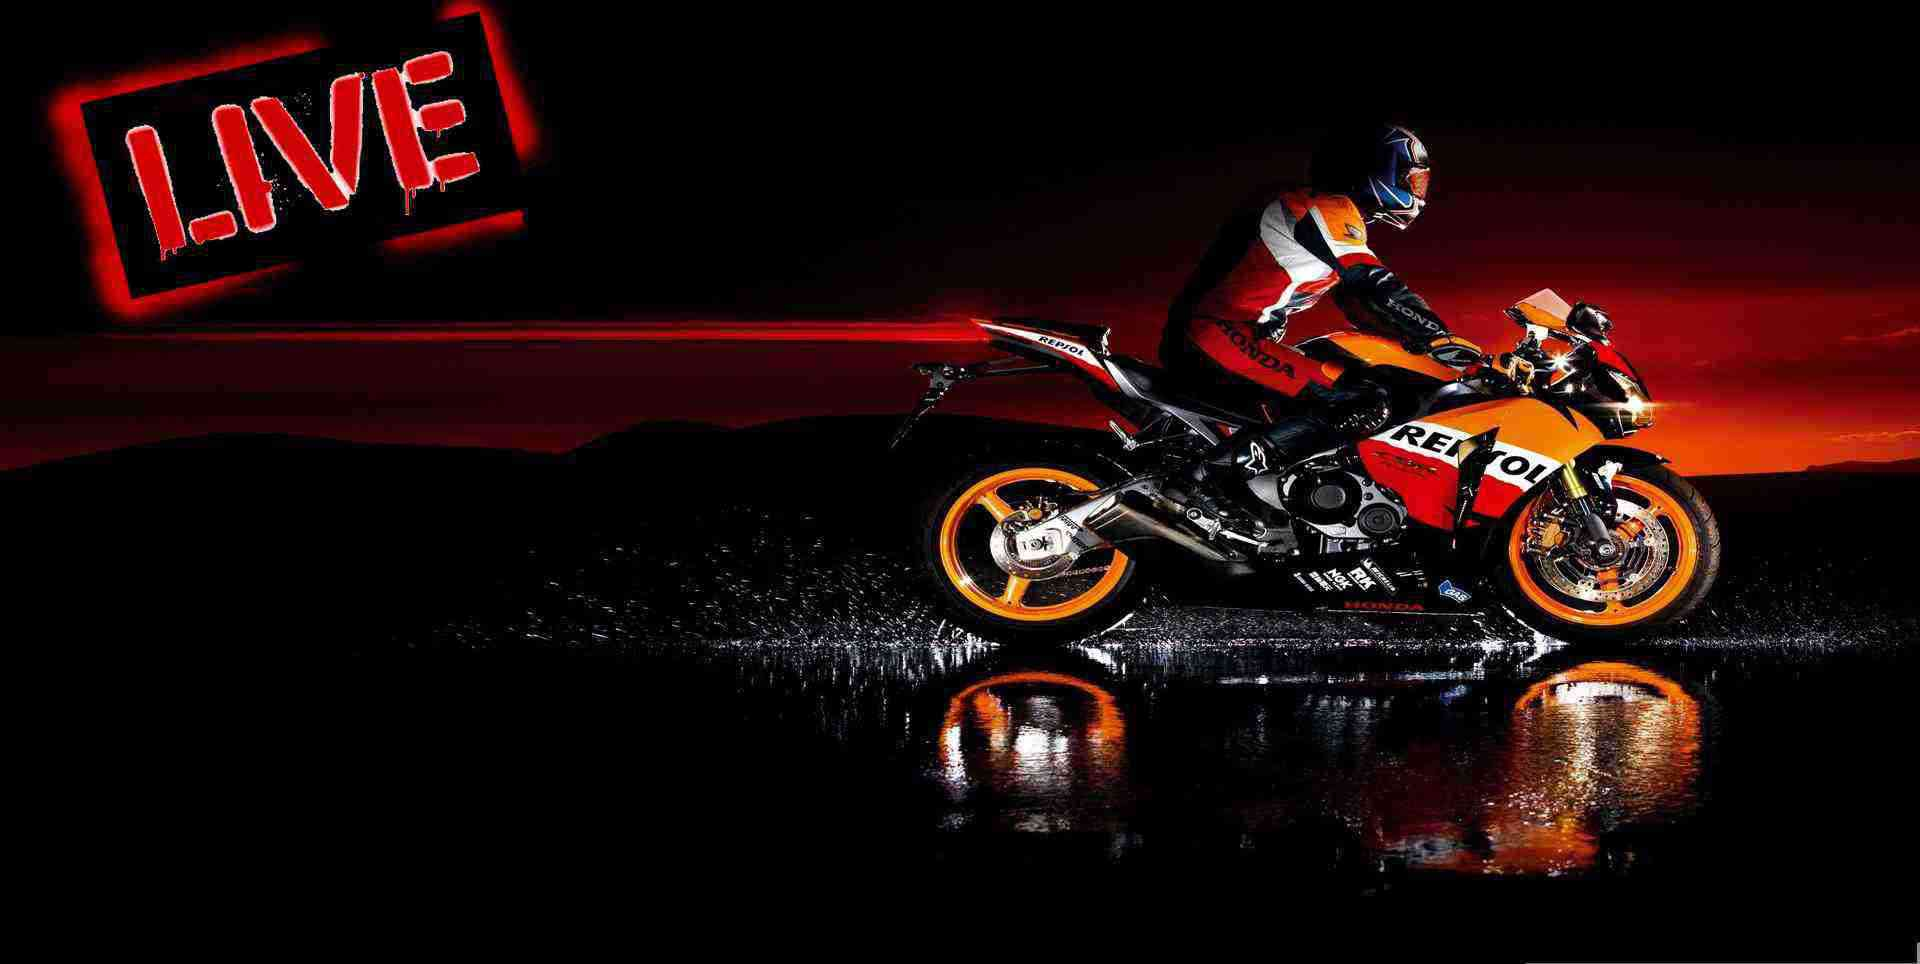 Super Bike Pirelli Spanish Round 11 Race 2015 Live